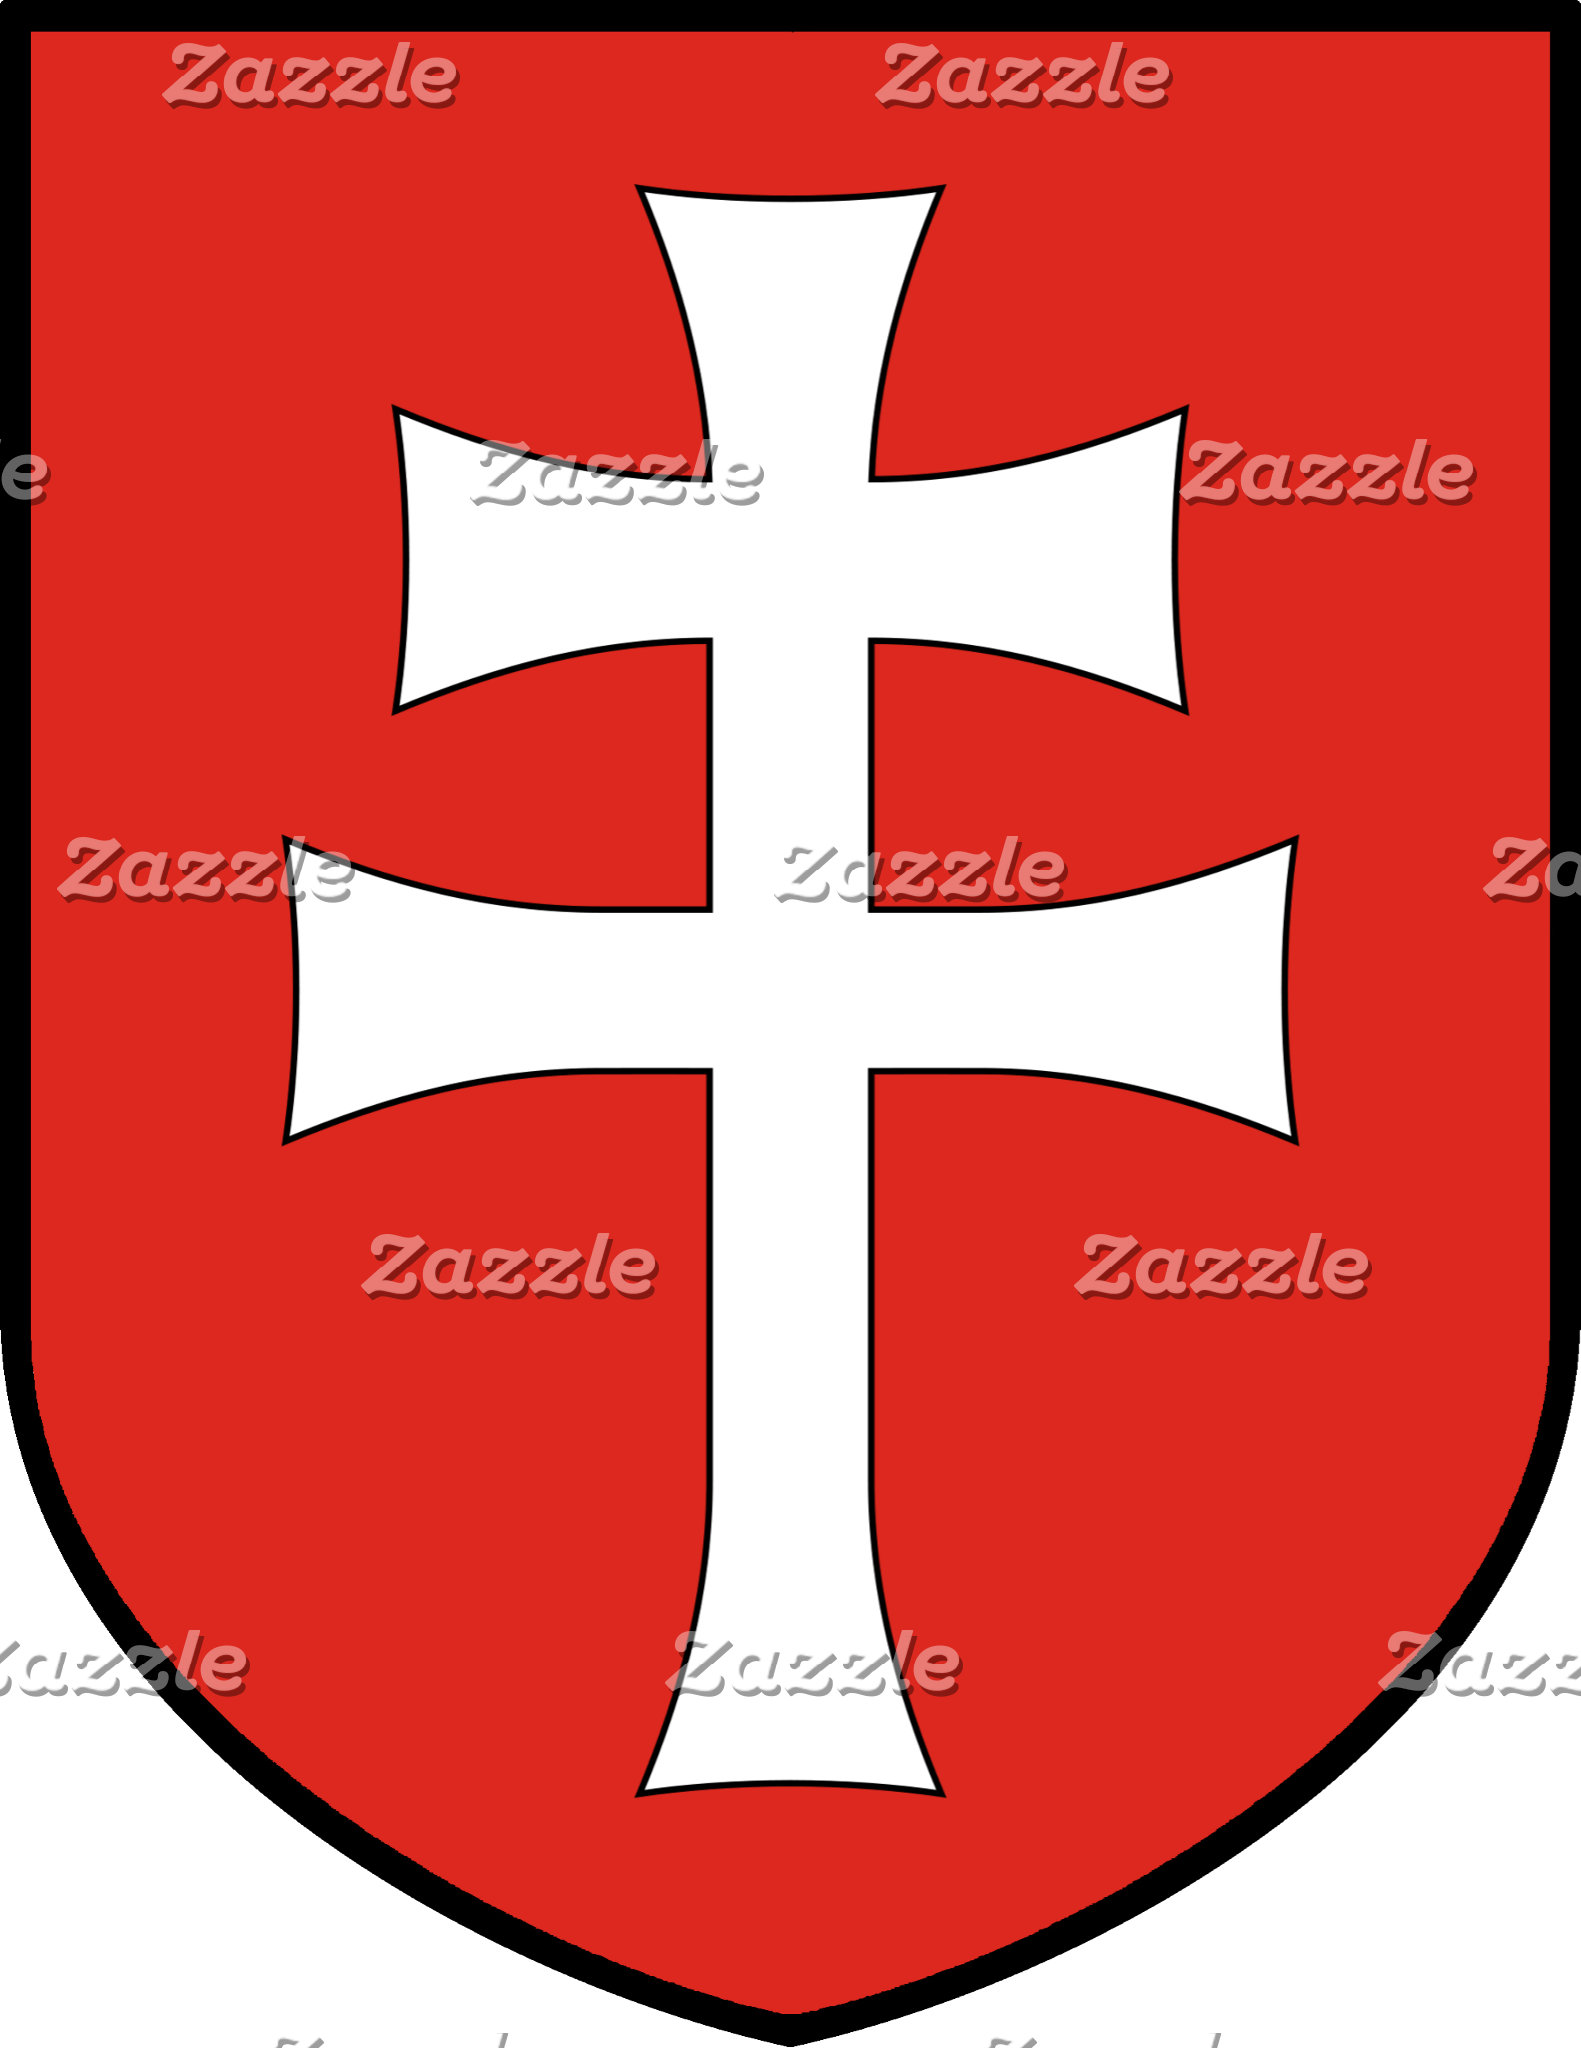 EASTERN EUROPEAN COAT OF ARMS